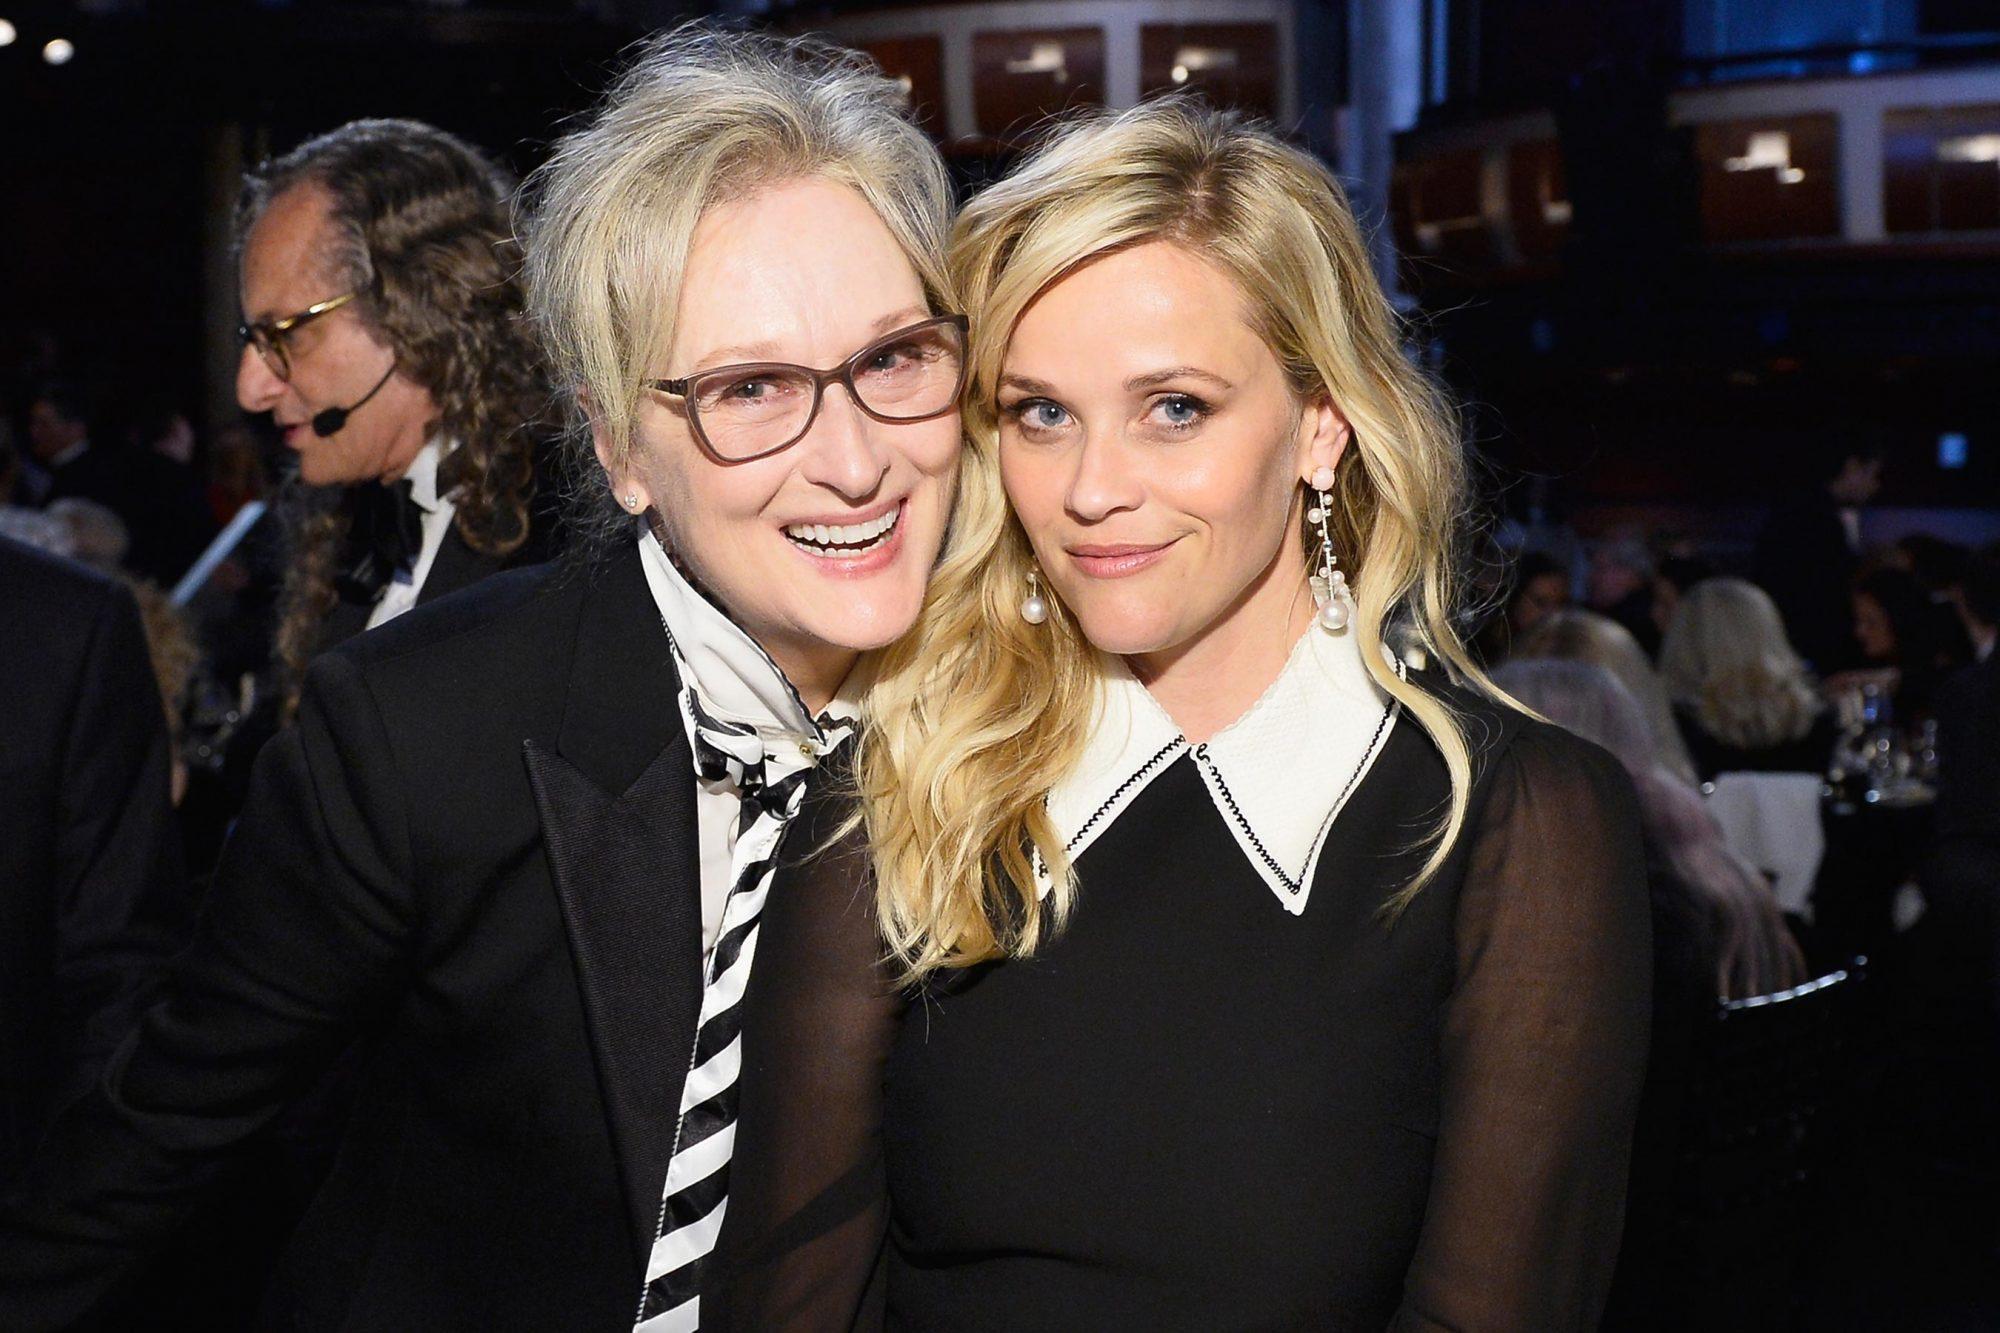 American Film Institute's 45th Life Achievement Award Gala Tribute to Diane Keaton - Roaming Show